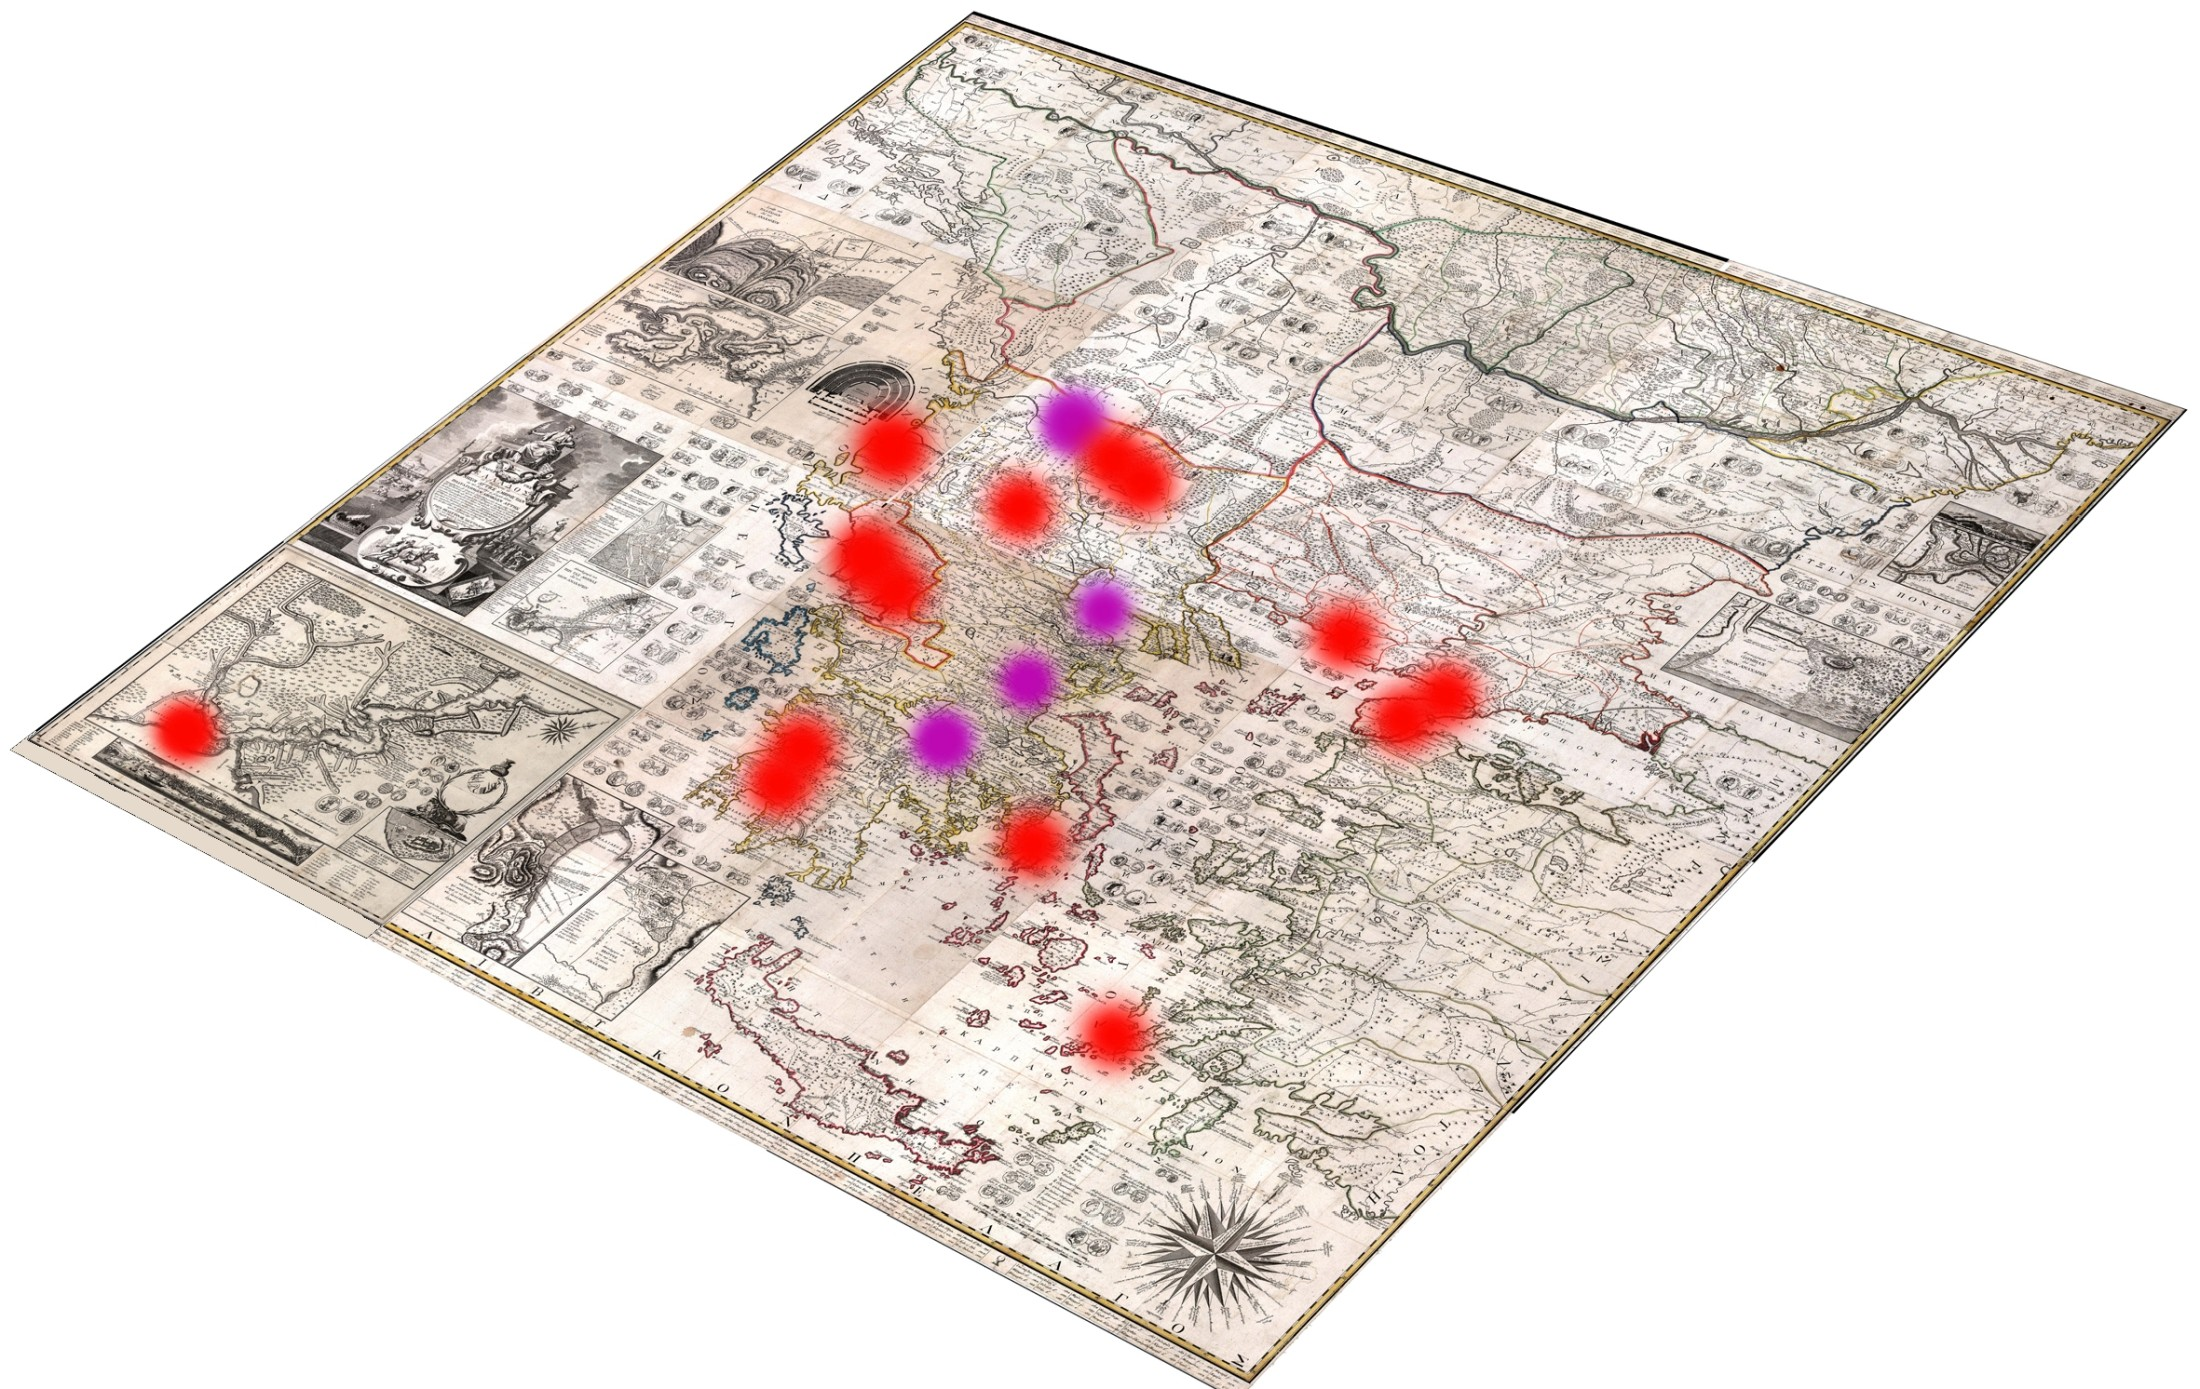 H Xάρτα του Ρήγα Βελεστινλή της Τρικογλείου Βιβλιοθήκης ΑΠΘ, με σημειωμένες τις είκοσι διαφορές των δύο τυπολογιών της και των παραλλαγών τους